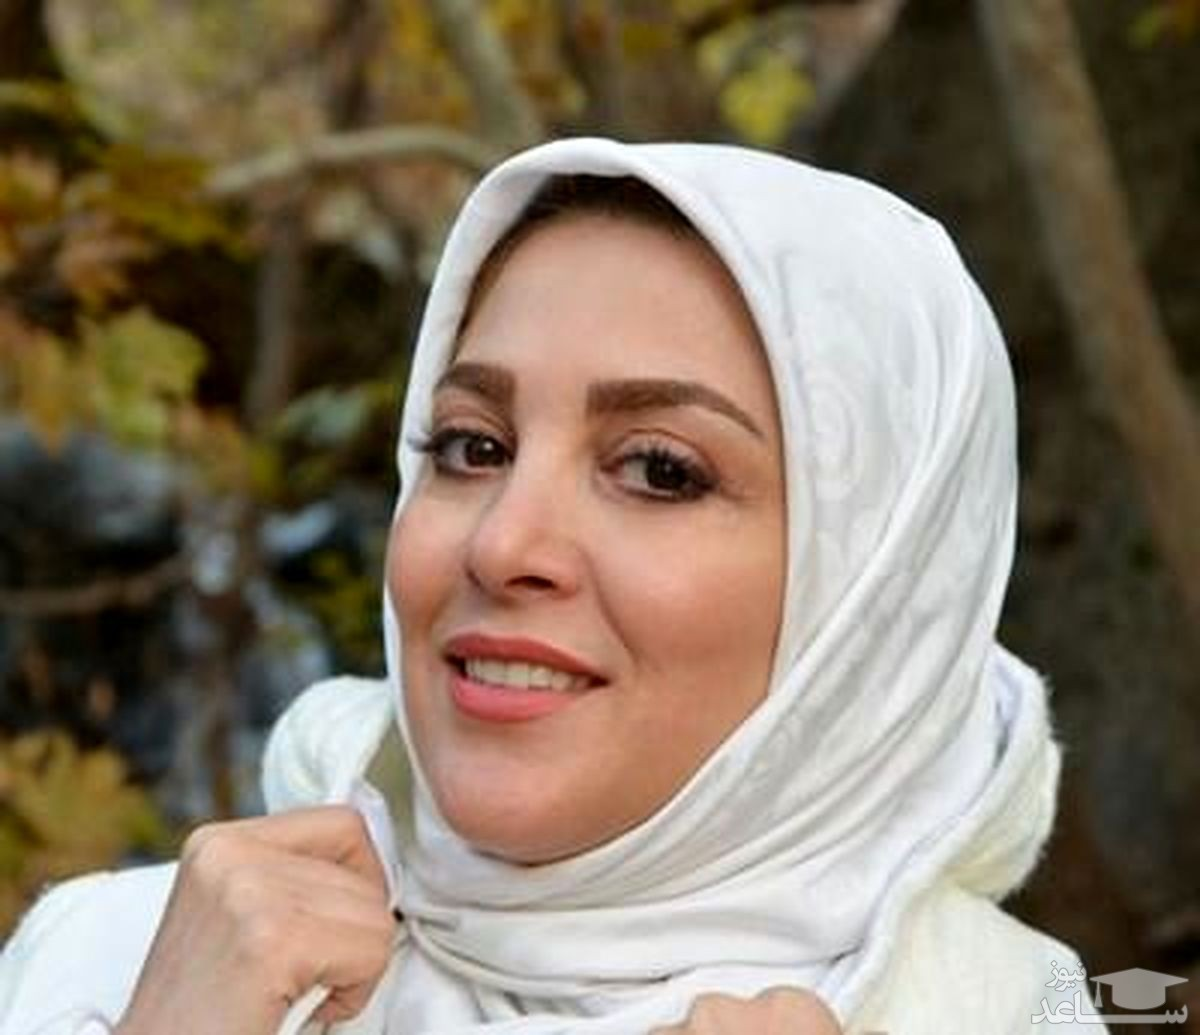 ژیلا صادقی، مجری جنجالی تلویزیون در آغوش همسرش